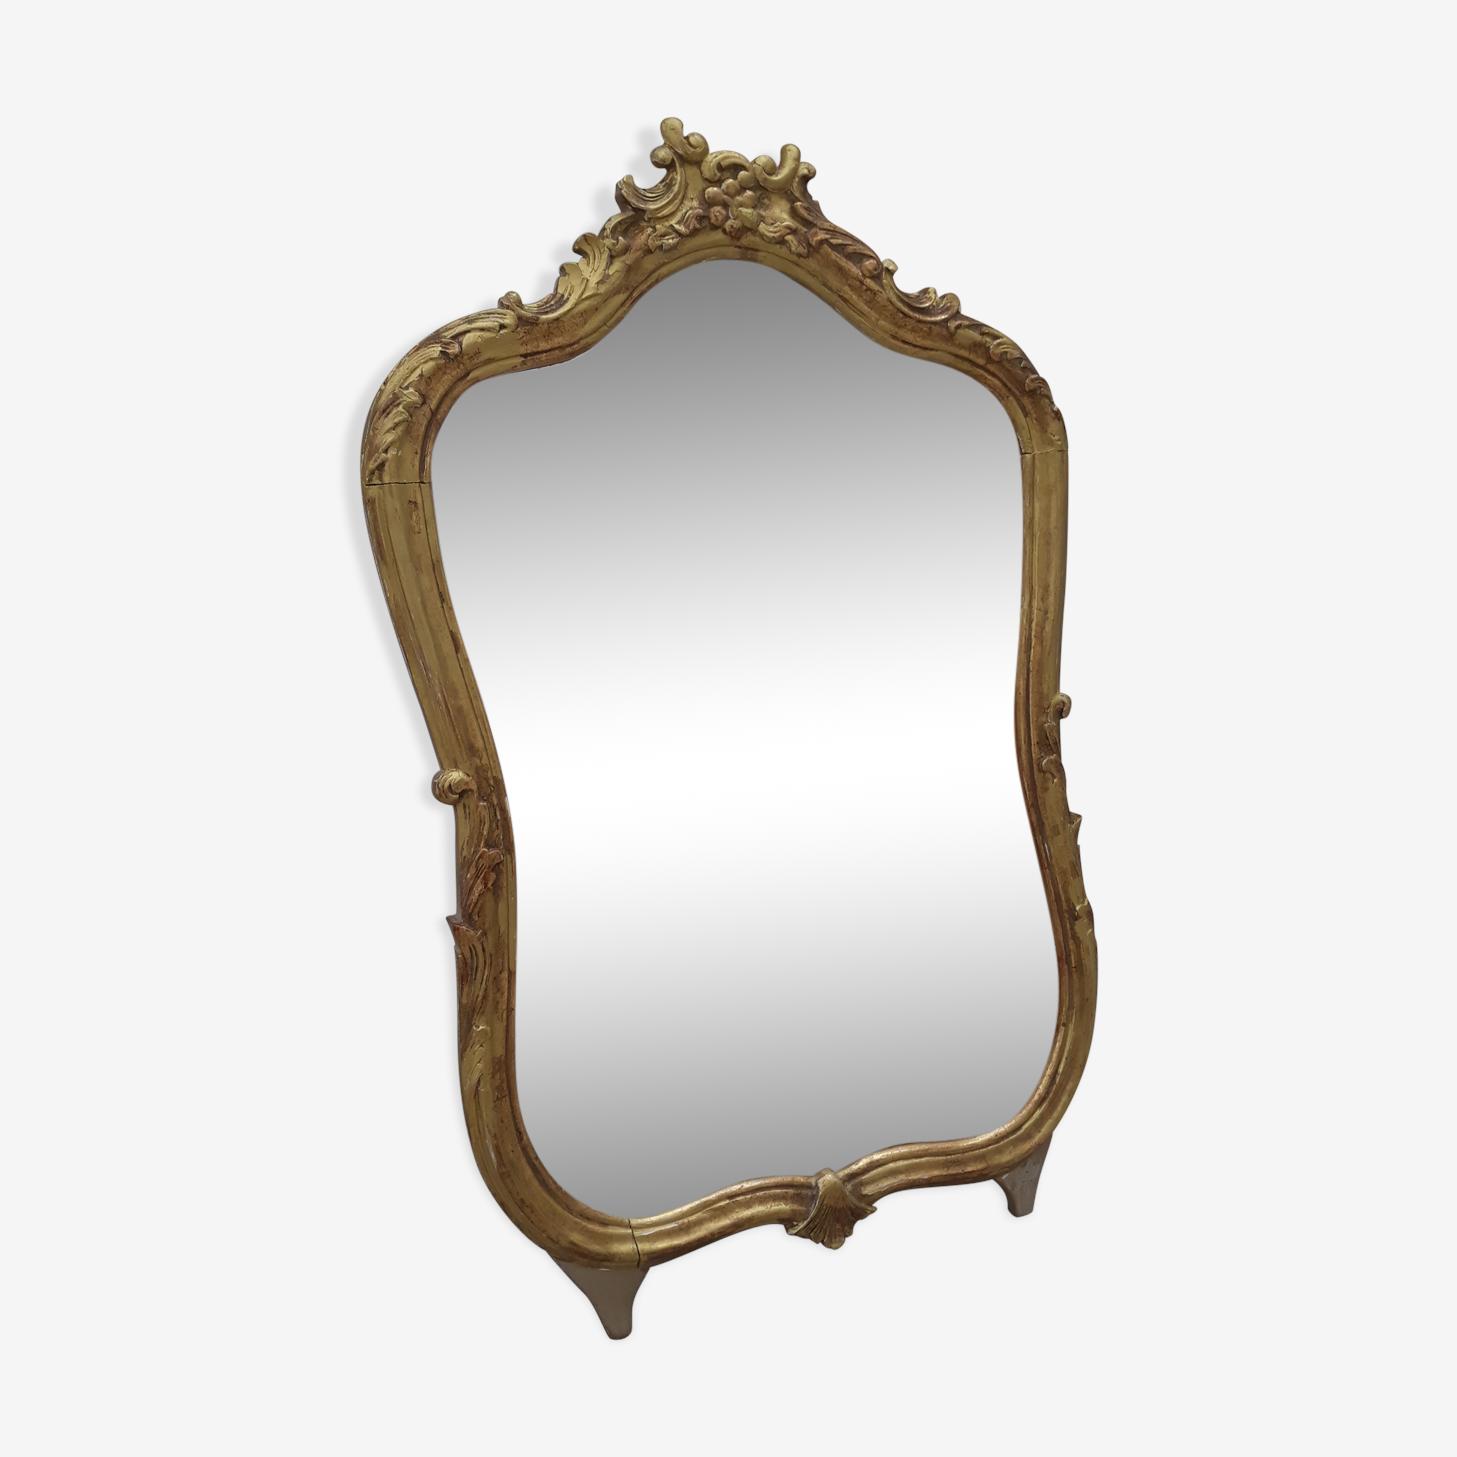 Miroir en bois doré  ancien style Louis XV - 48x72cm